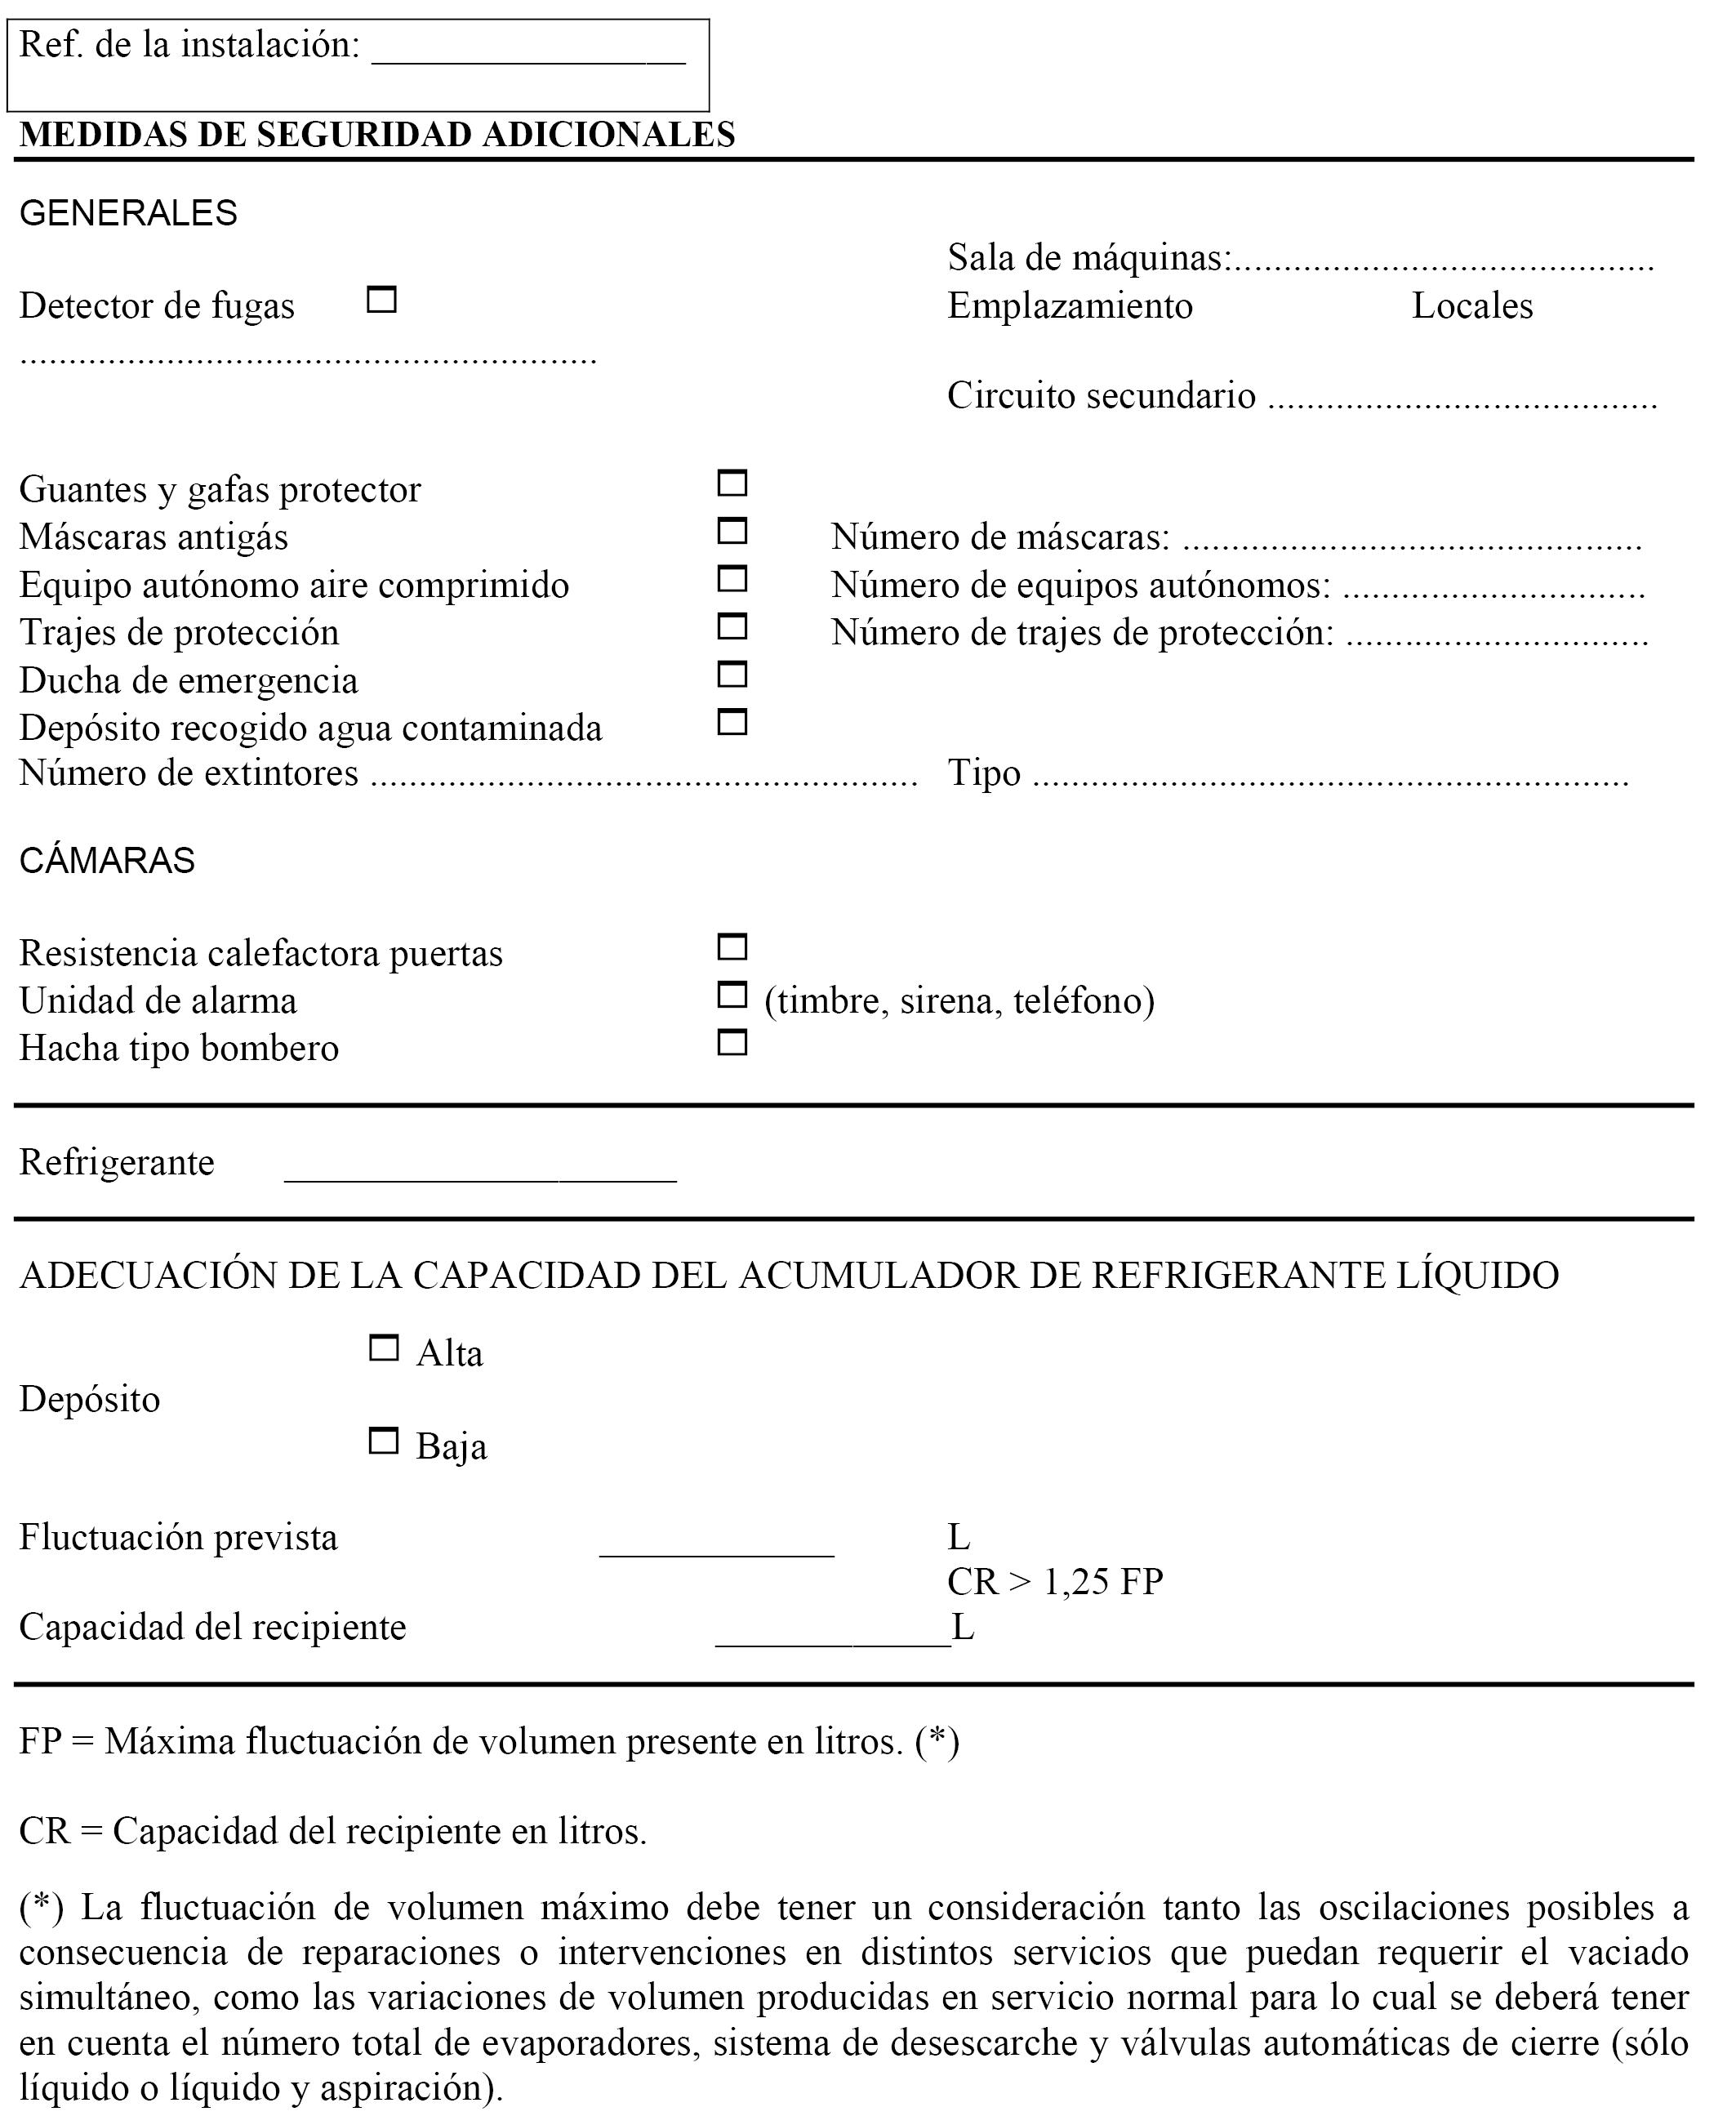 BOE.es - Documento BOE-A-2011-4292 a415cc95b02